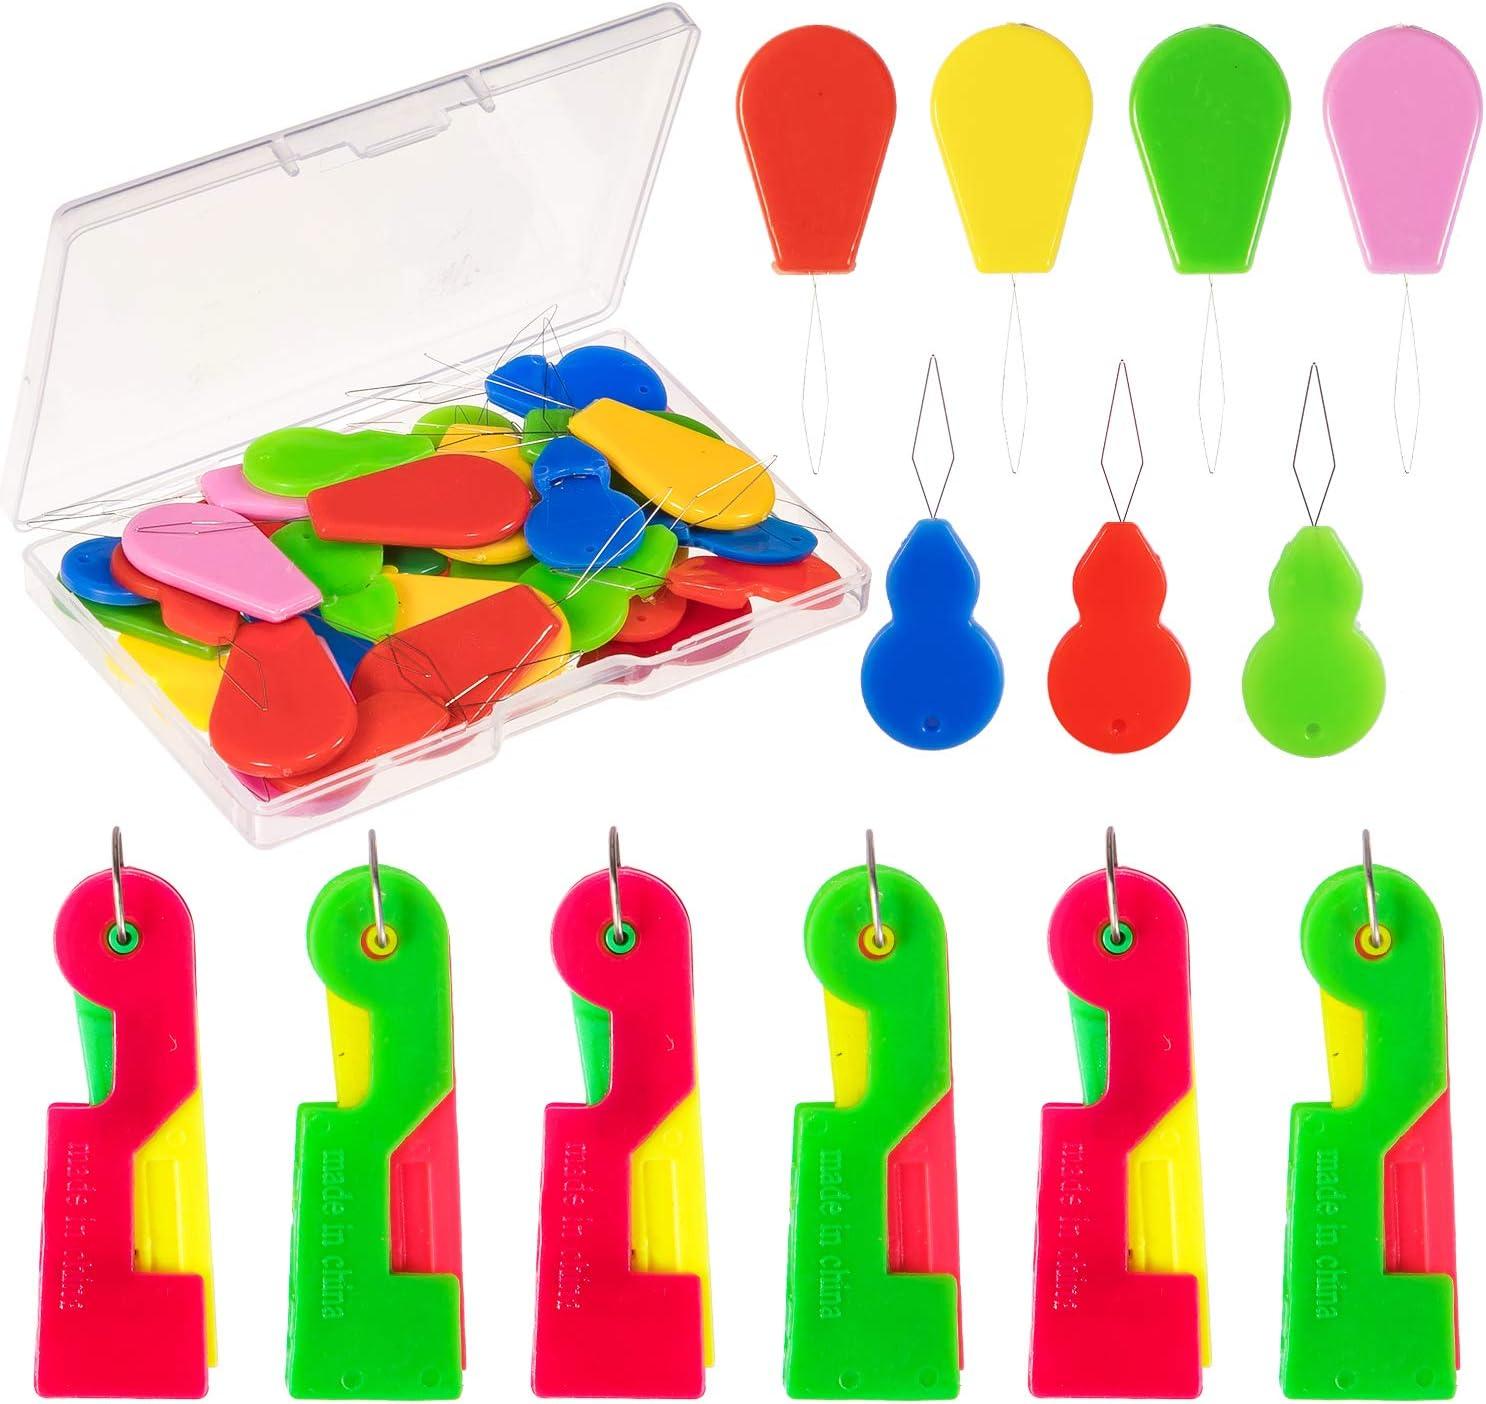 Whaline - Enhebrador automático de agujas para máquina de coser (50 unidades)